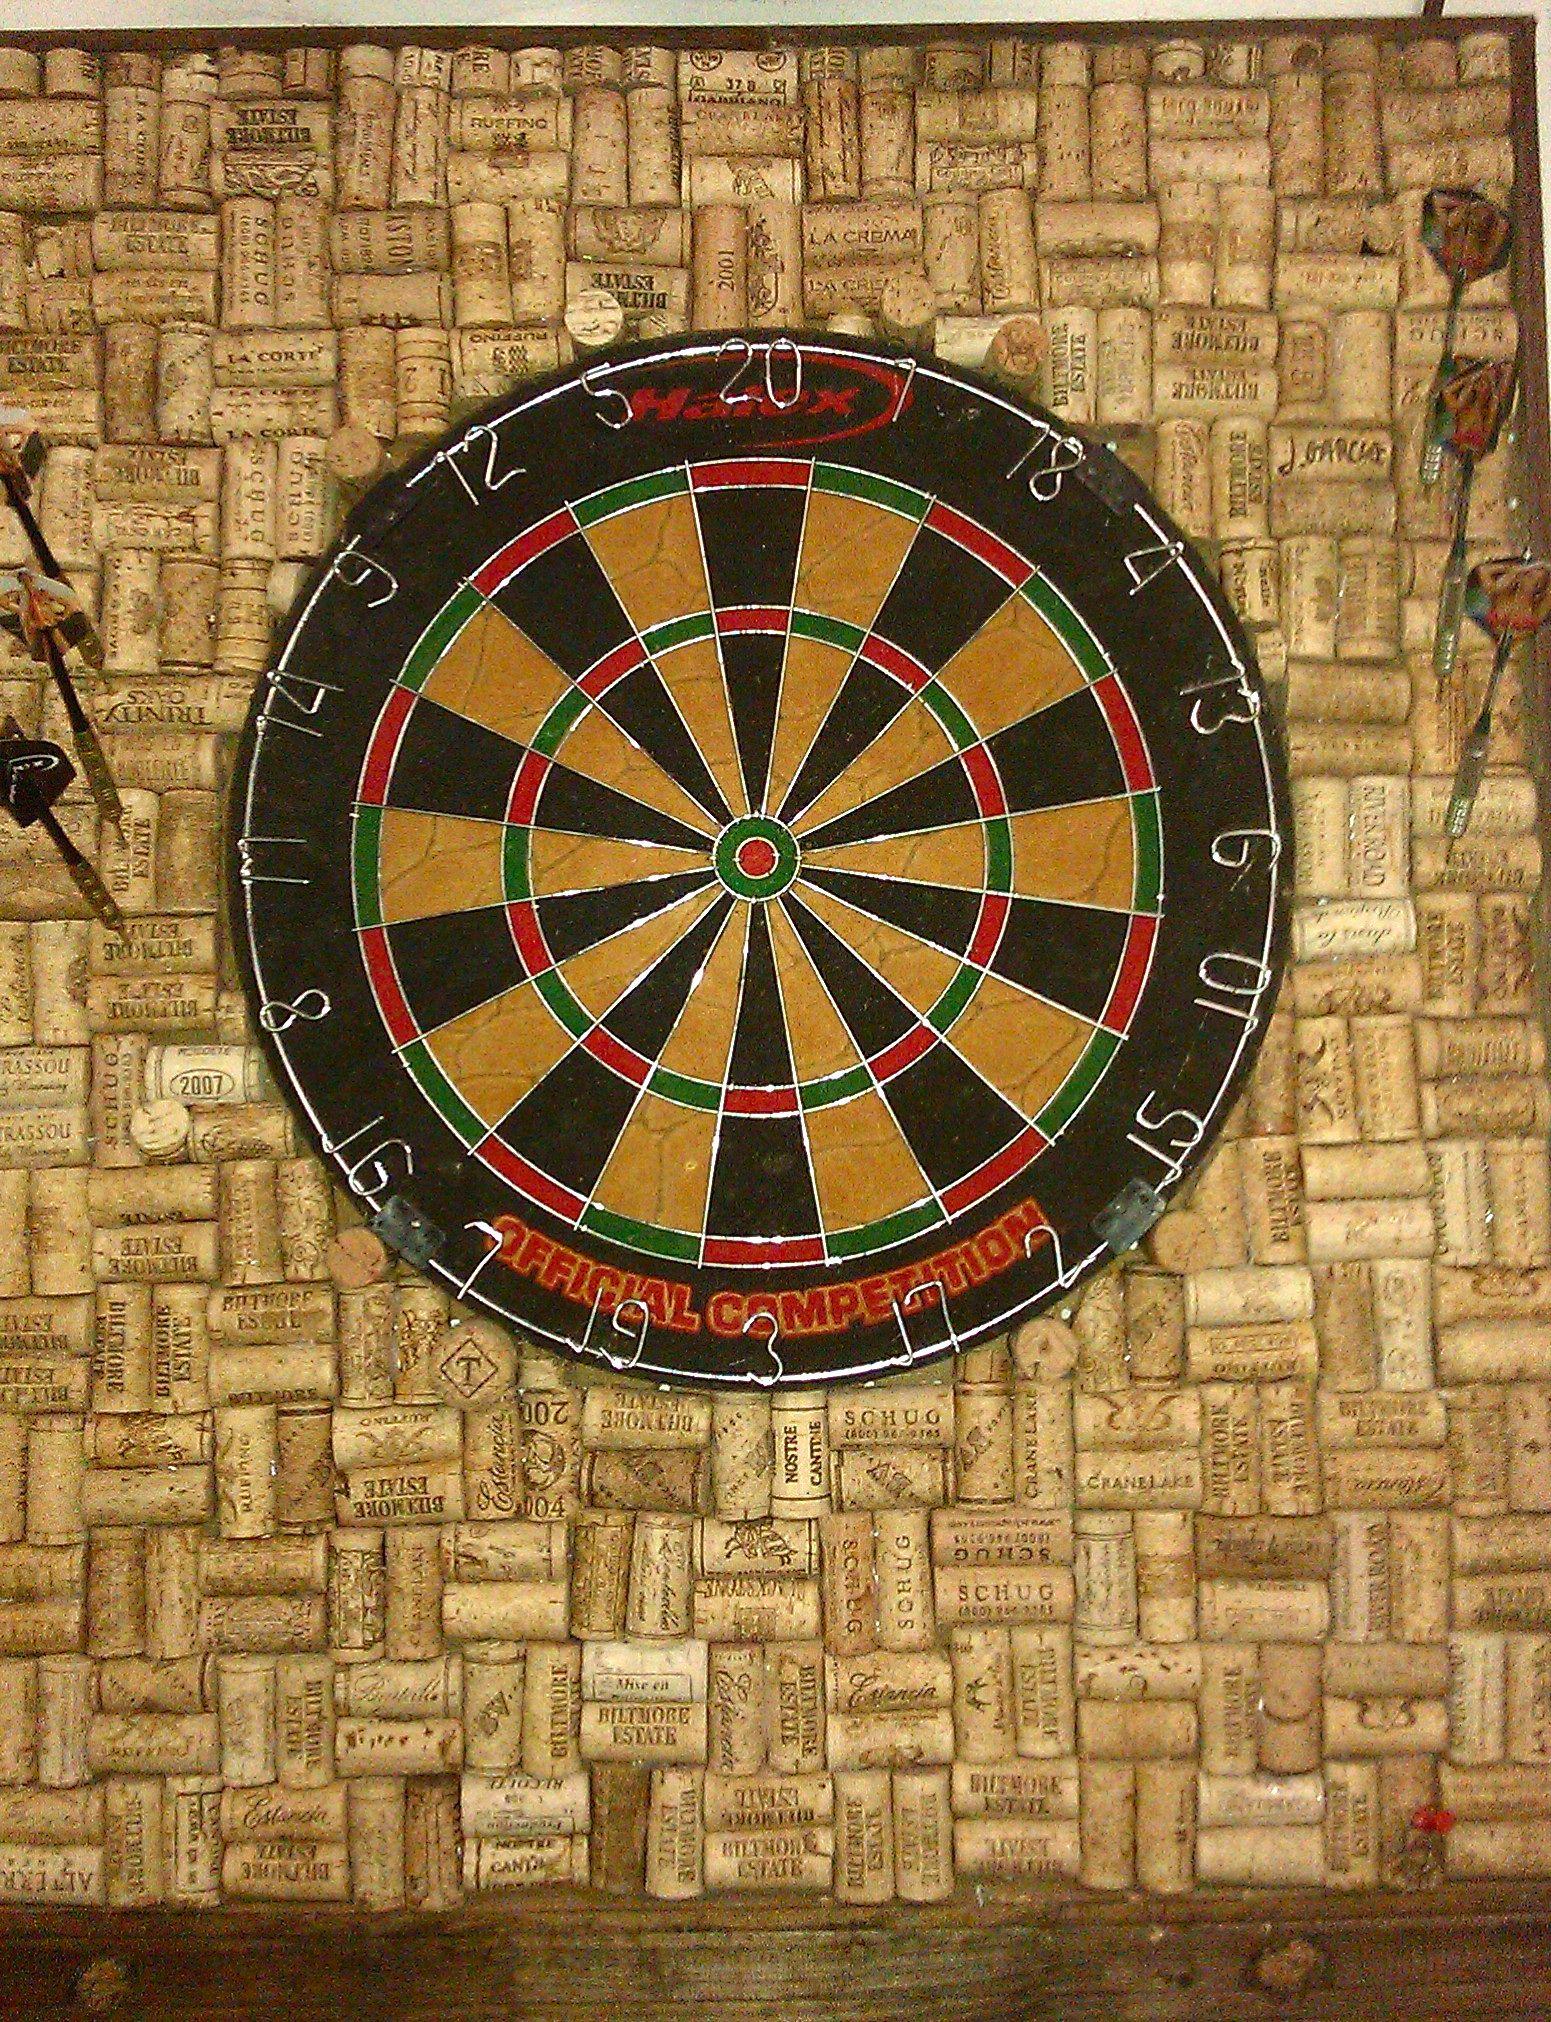 dart board made out of wine corks for the home garden pinterest dart board cork and yards. Black Bedroom Furniture Sets. Home Design Ideas